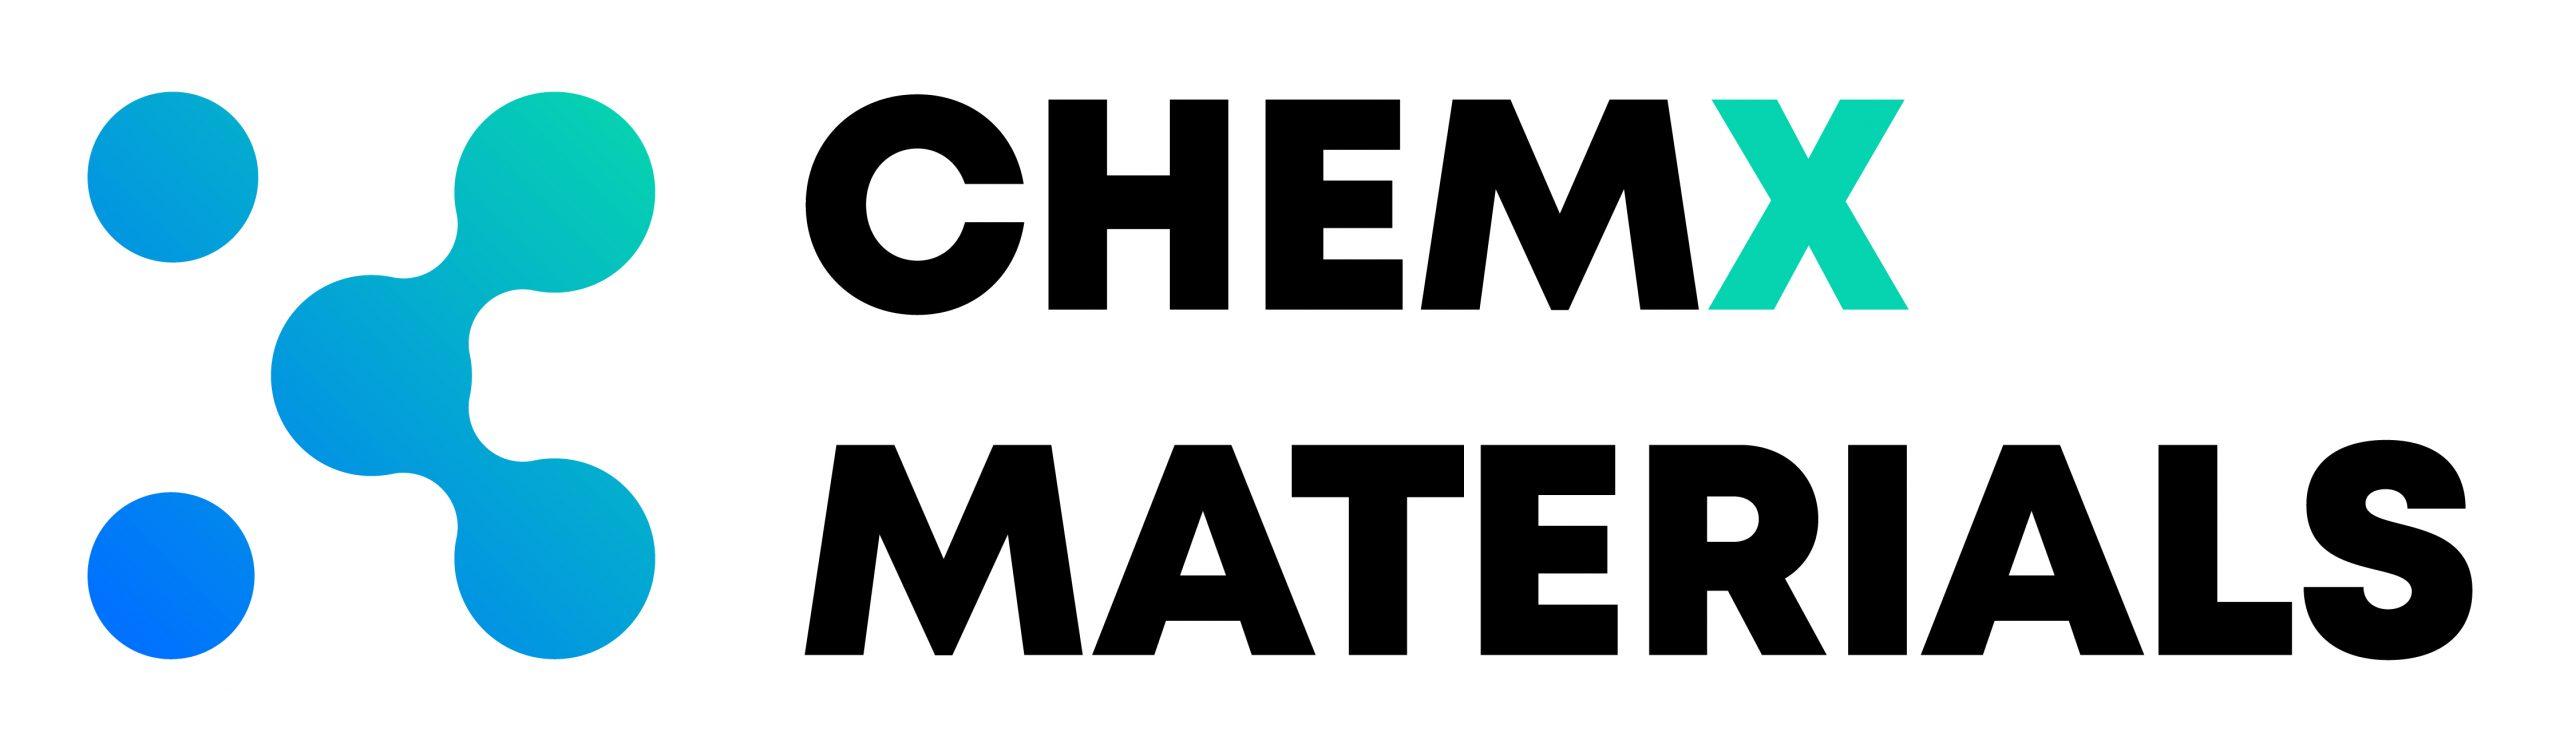 Whole logo on a white background